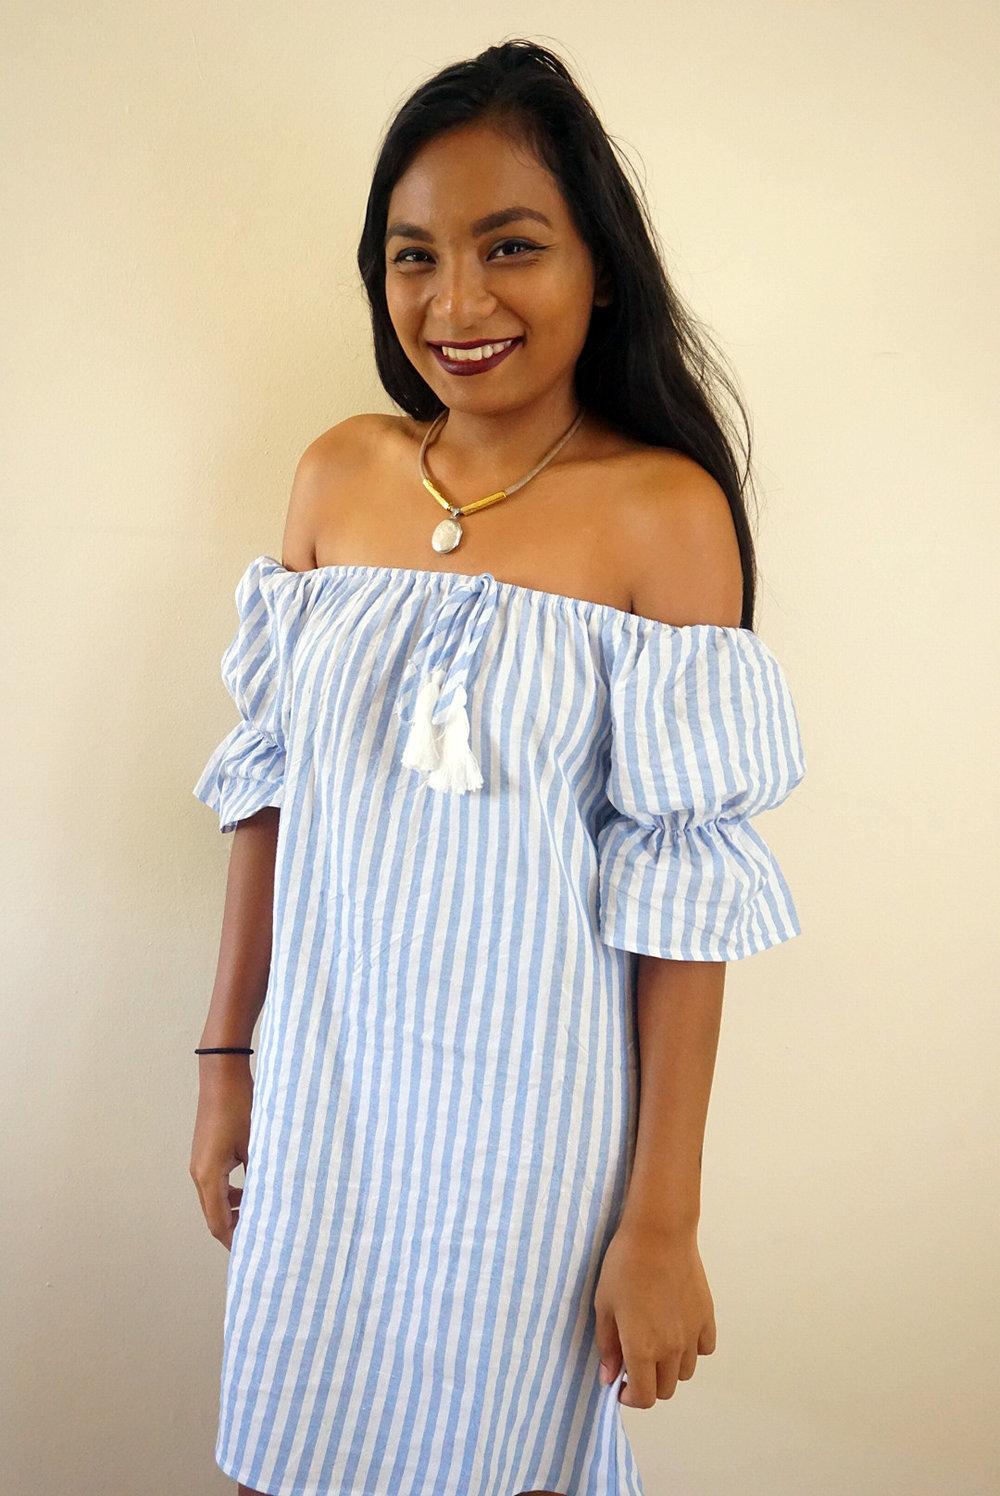 Off-the-shoulder-striped-dress-summer-fall-style-blogger-LINDATENCHITRAN-2-1616x1080.jpg